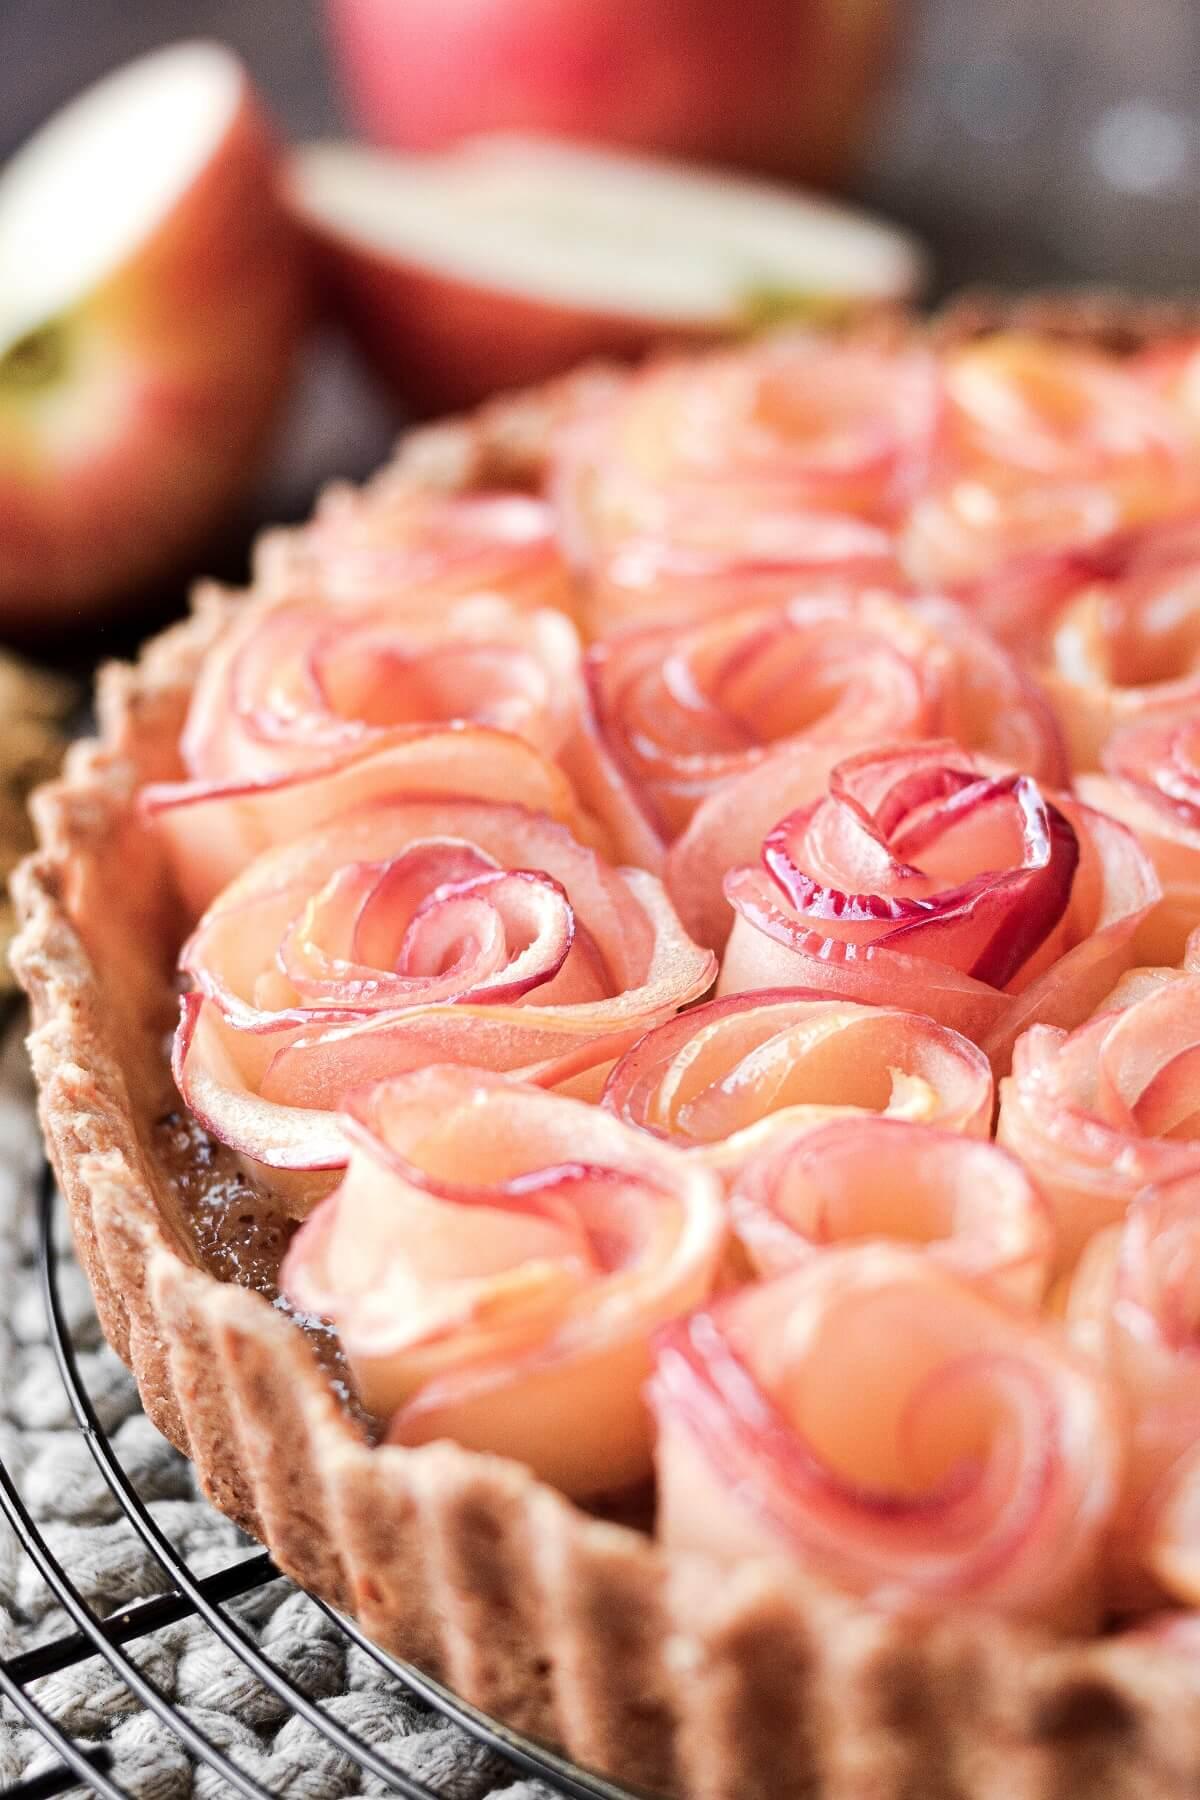 Closeup of apple roses in a tart crust.